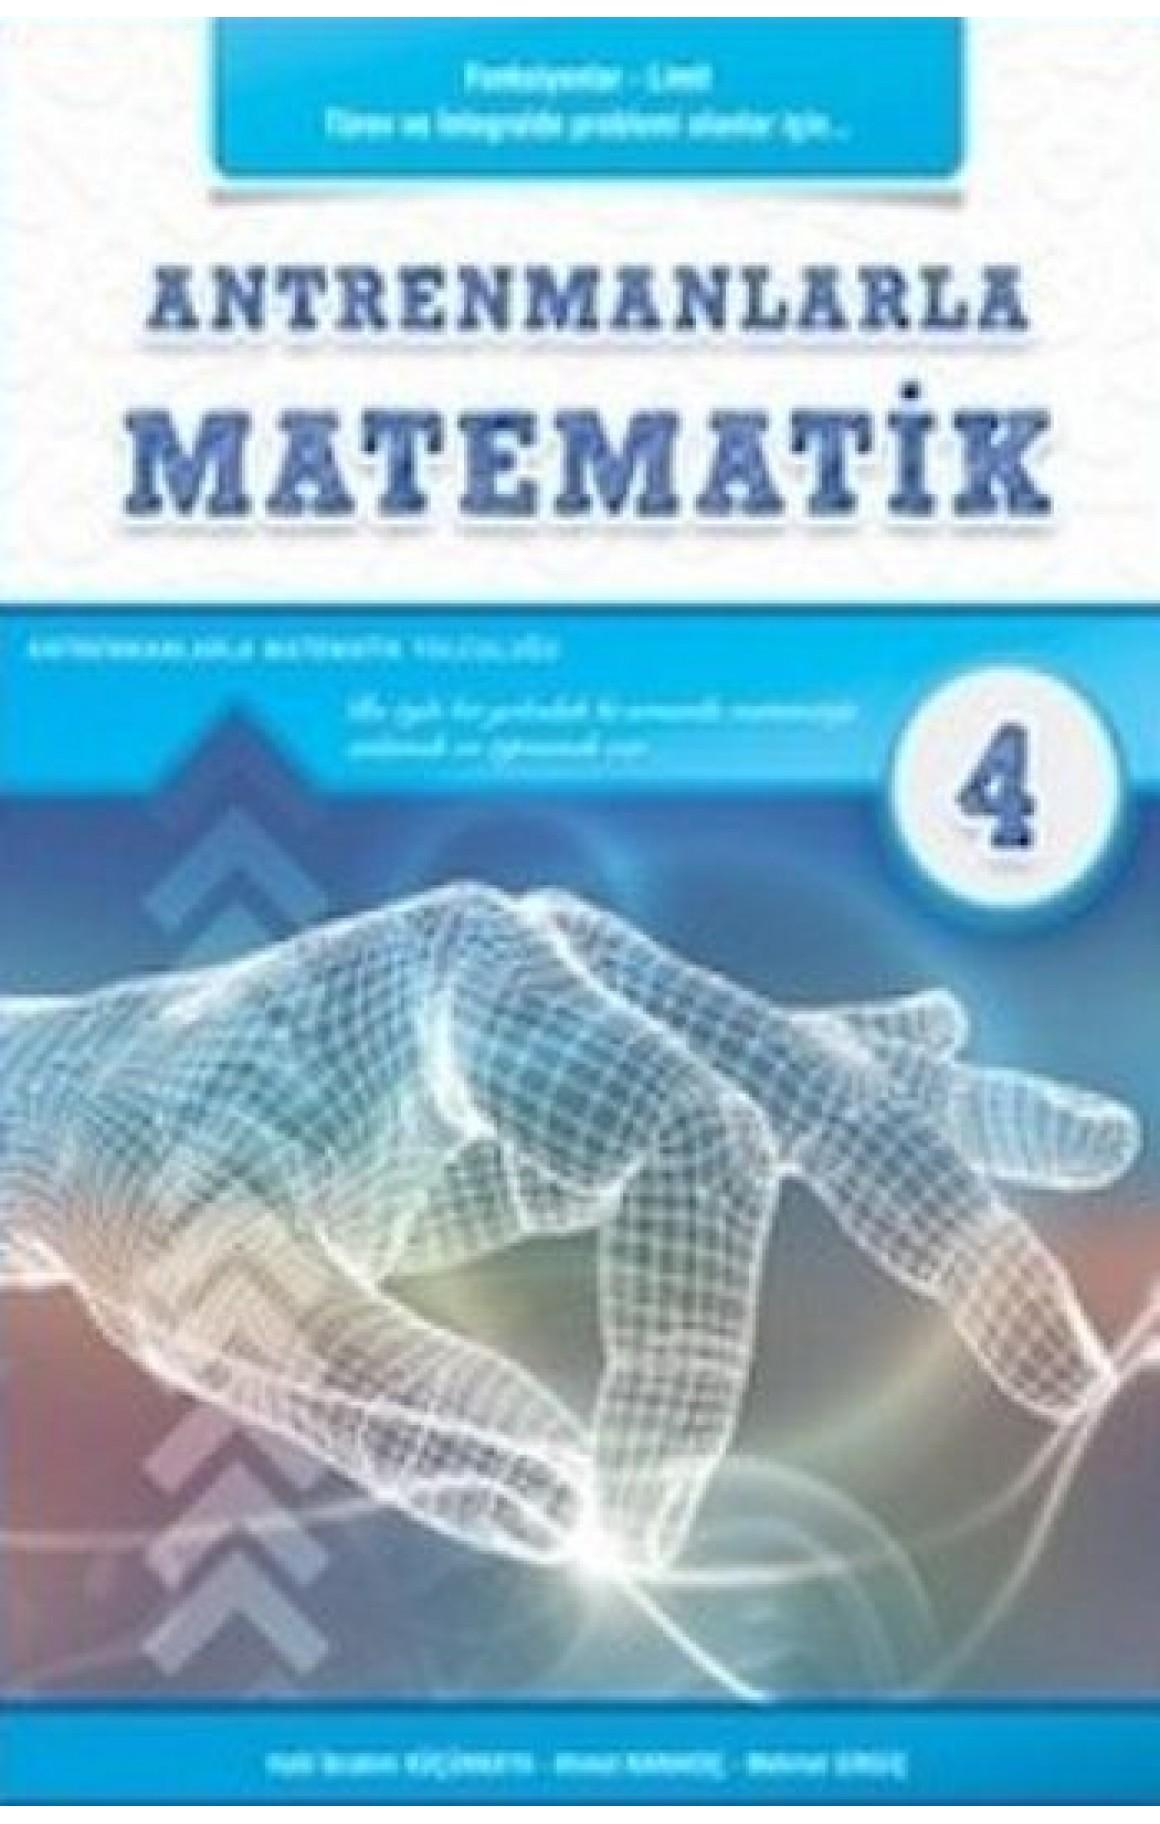 Antrenmanlarla Matematik - 4